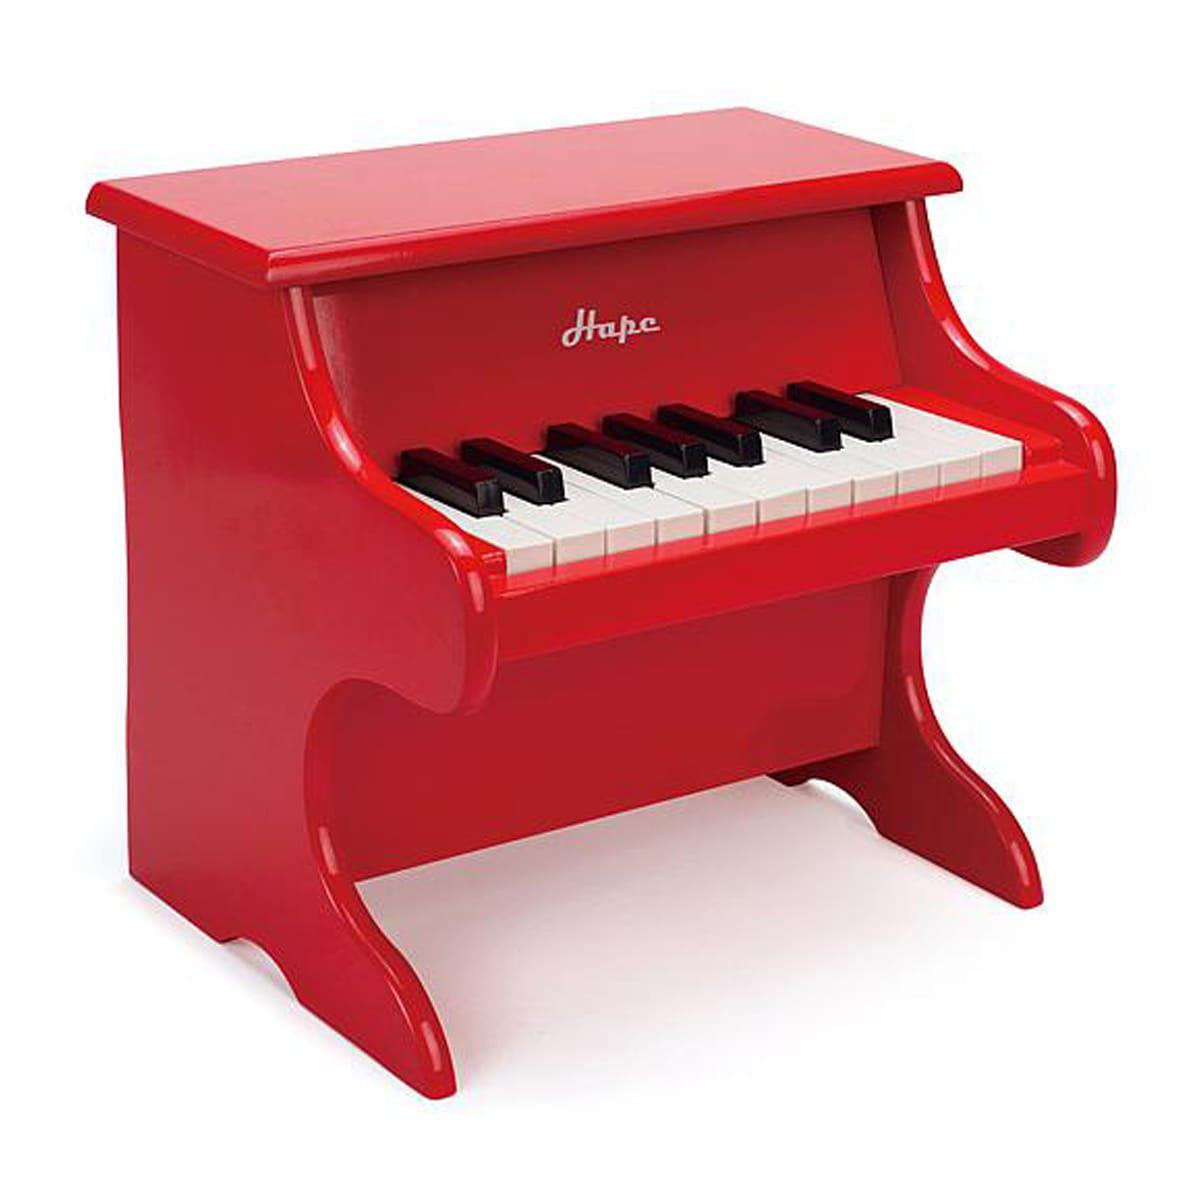 Piano PLAYFUL PIANO Hape